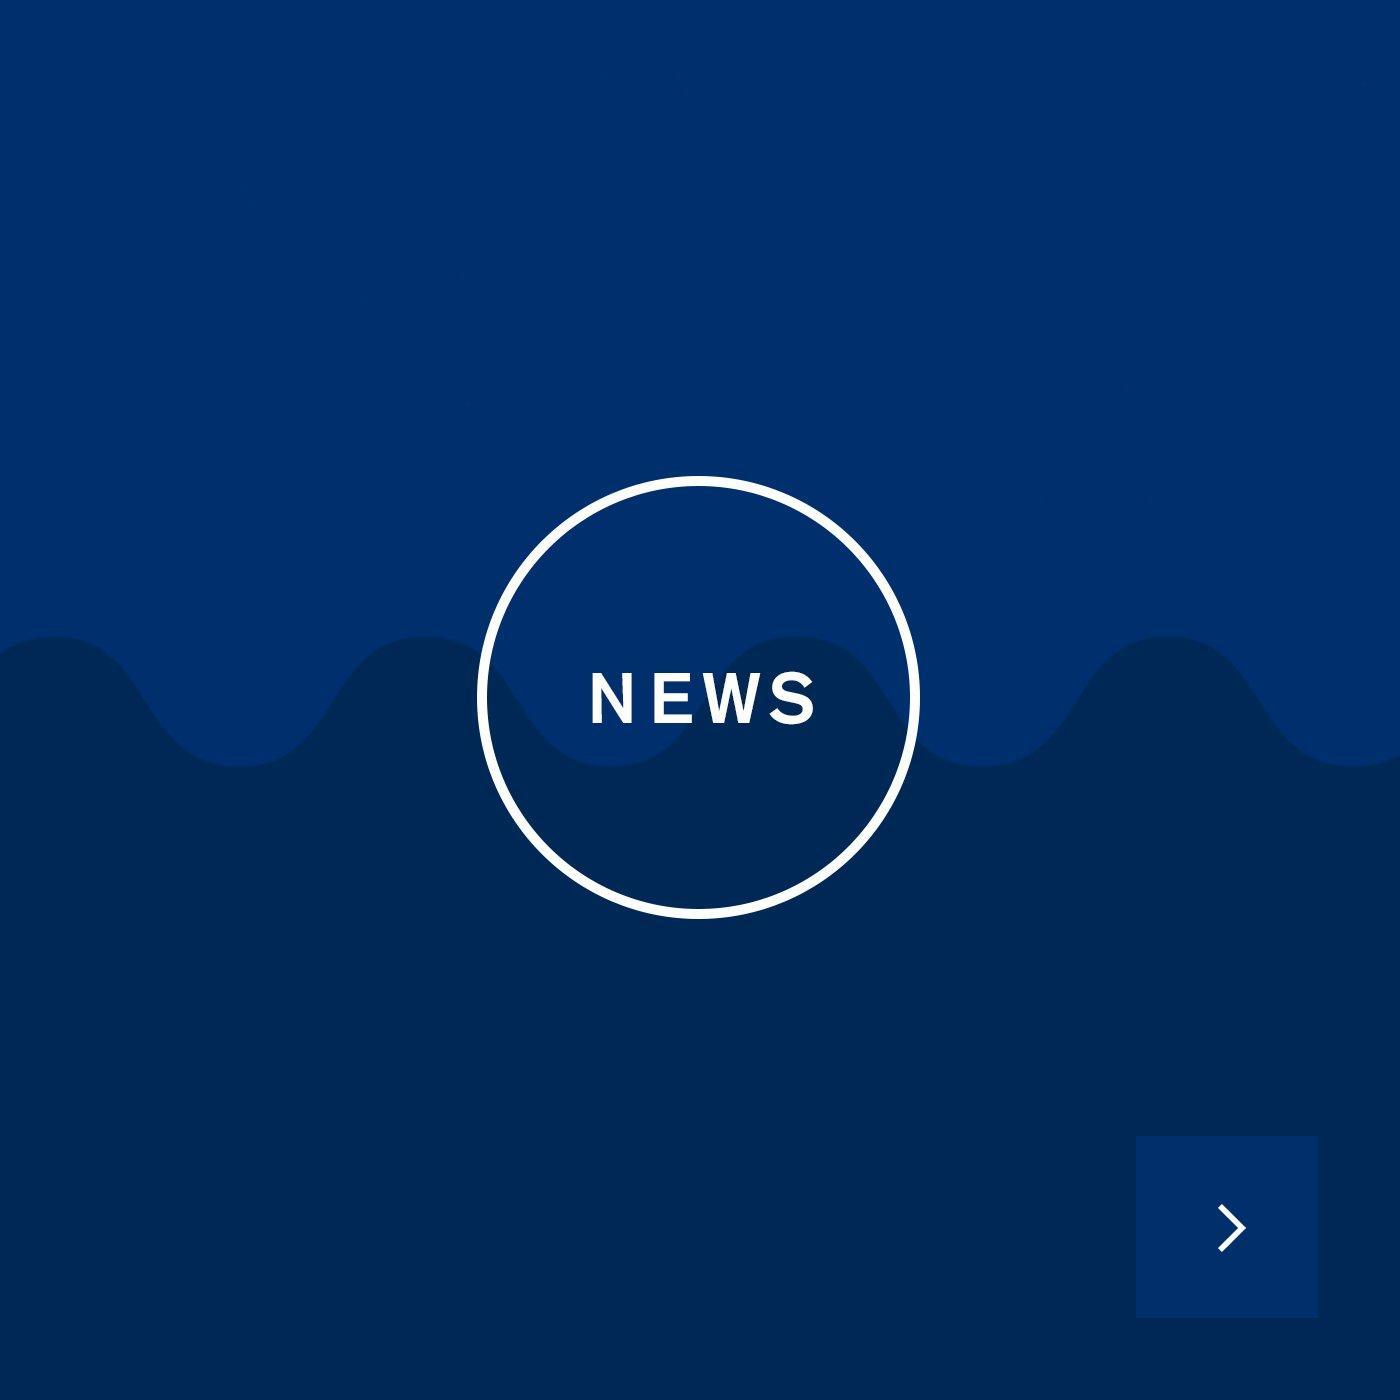 K2 Snowboarding News